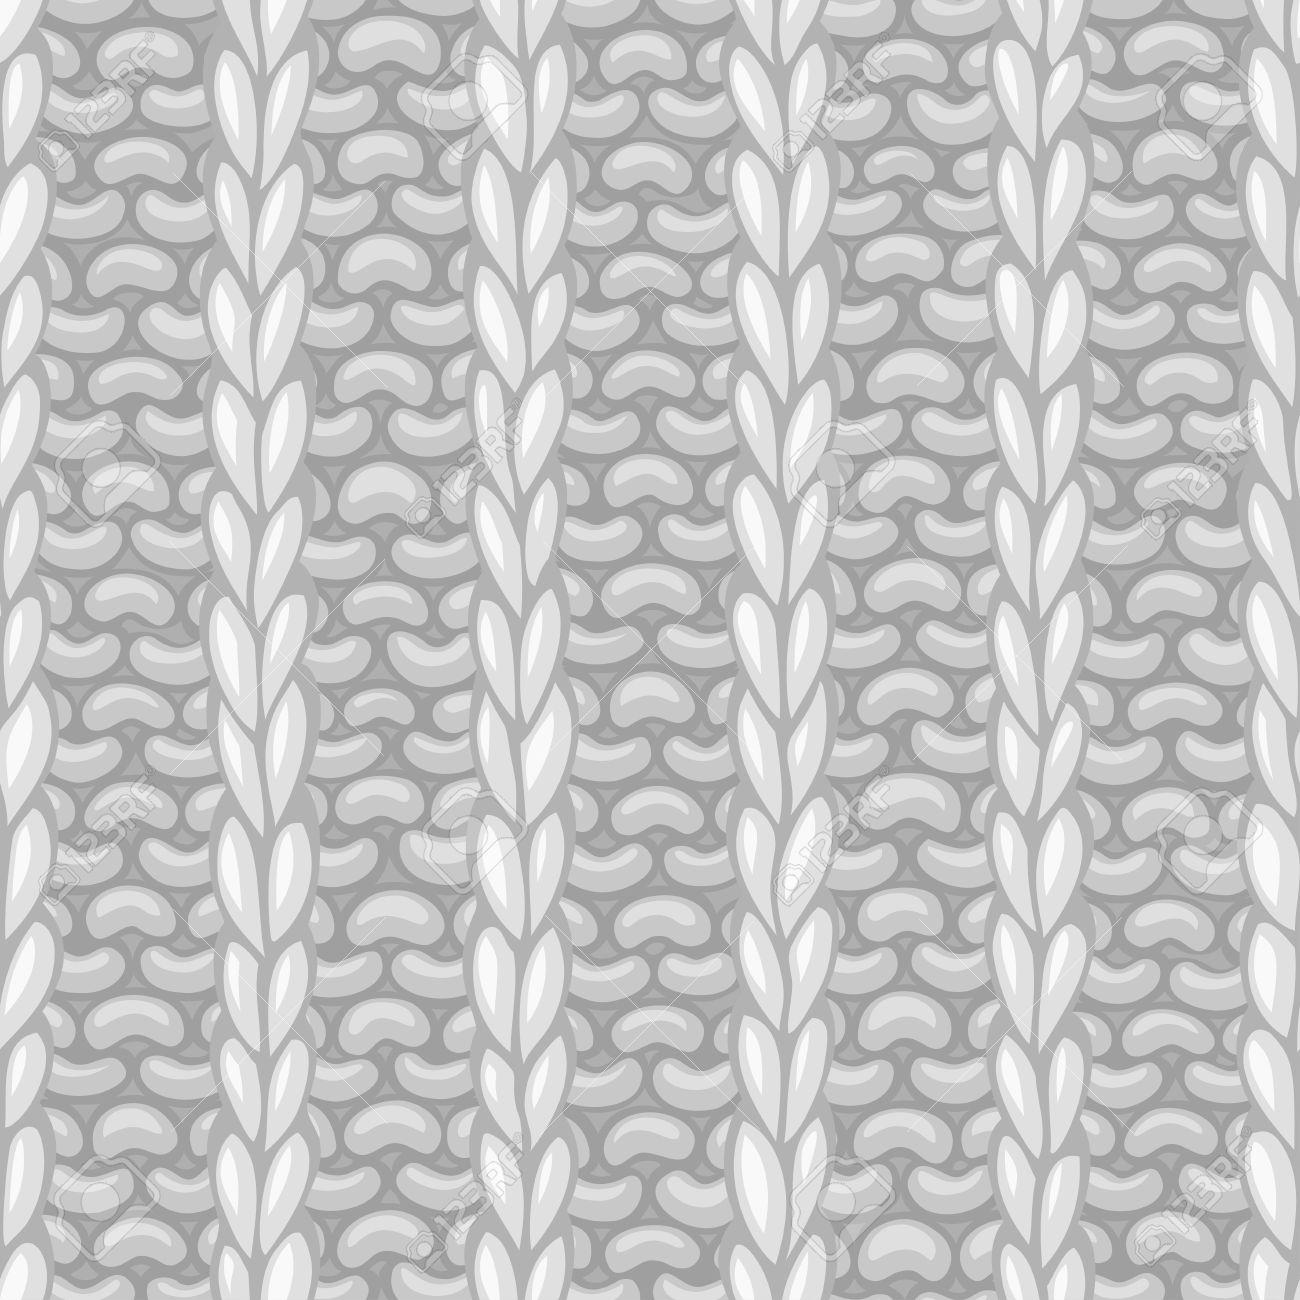 Vector Seamless Knitting Pattern. Rib Stitch 1x1 Texture. Vector ...